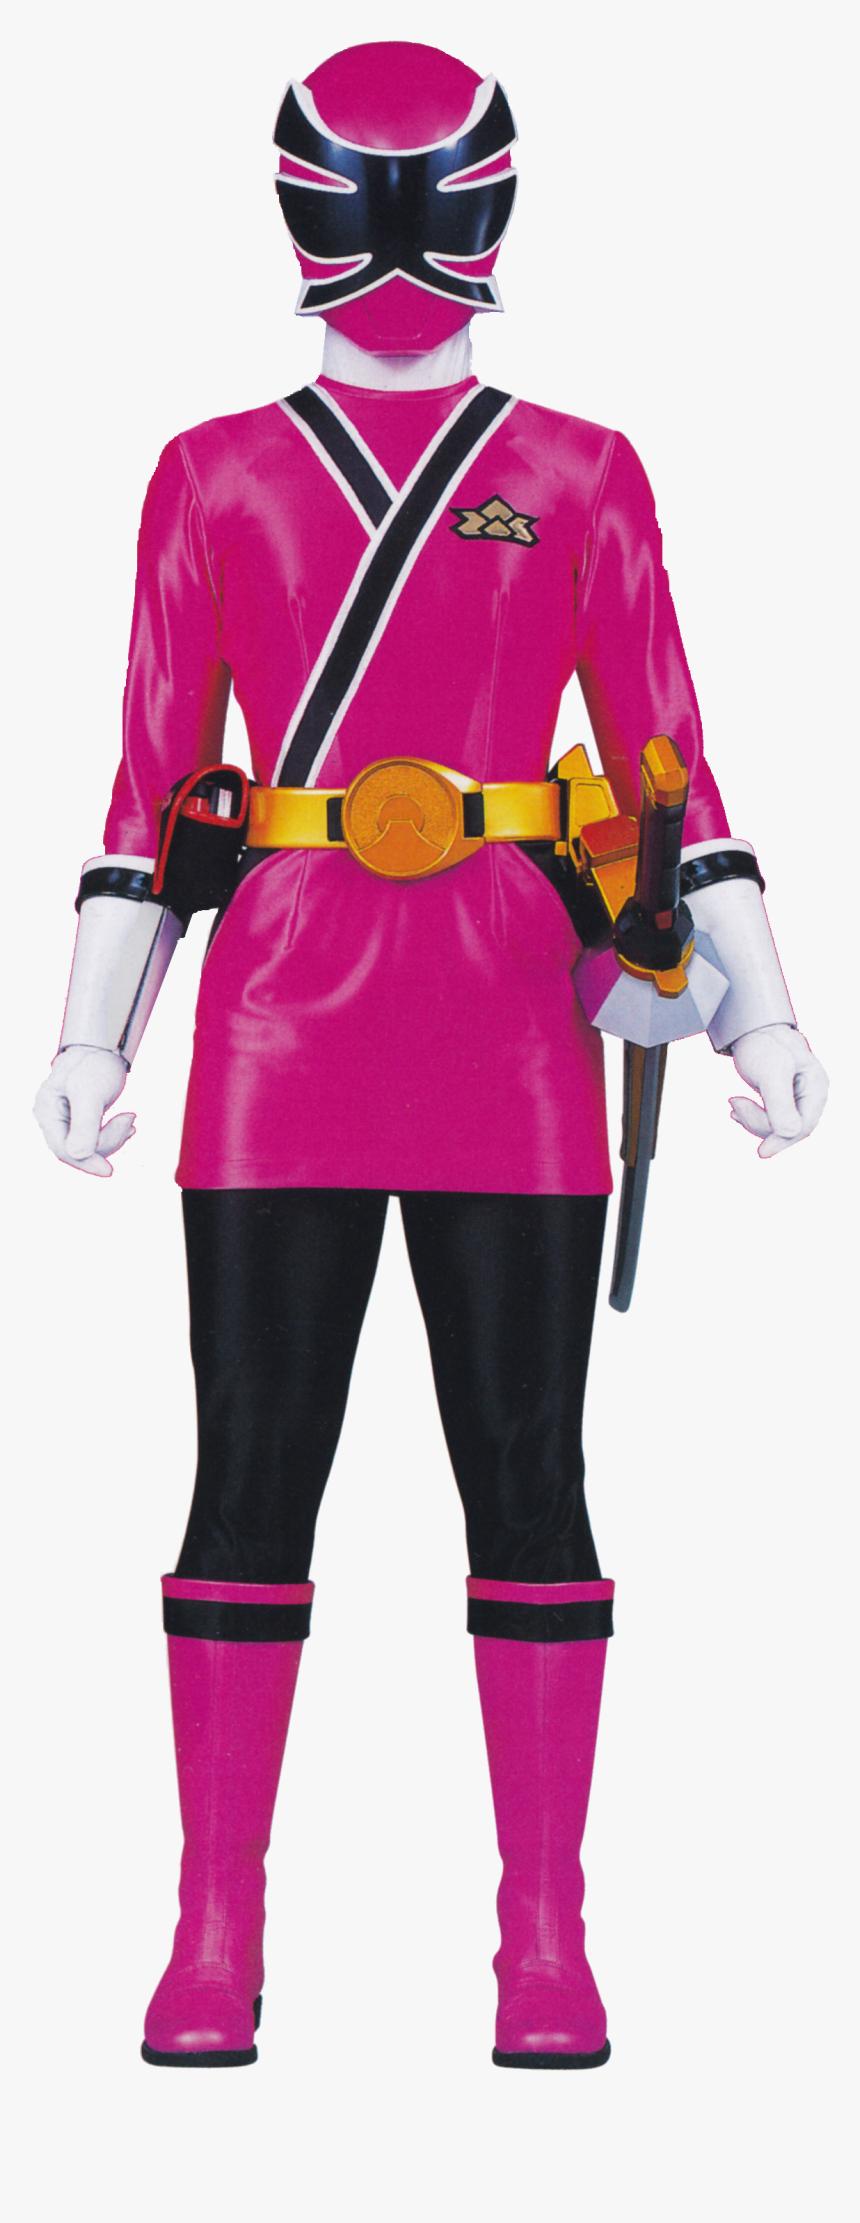 Jason Scott Pink Power Rangers, HD Png Download, Free Download